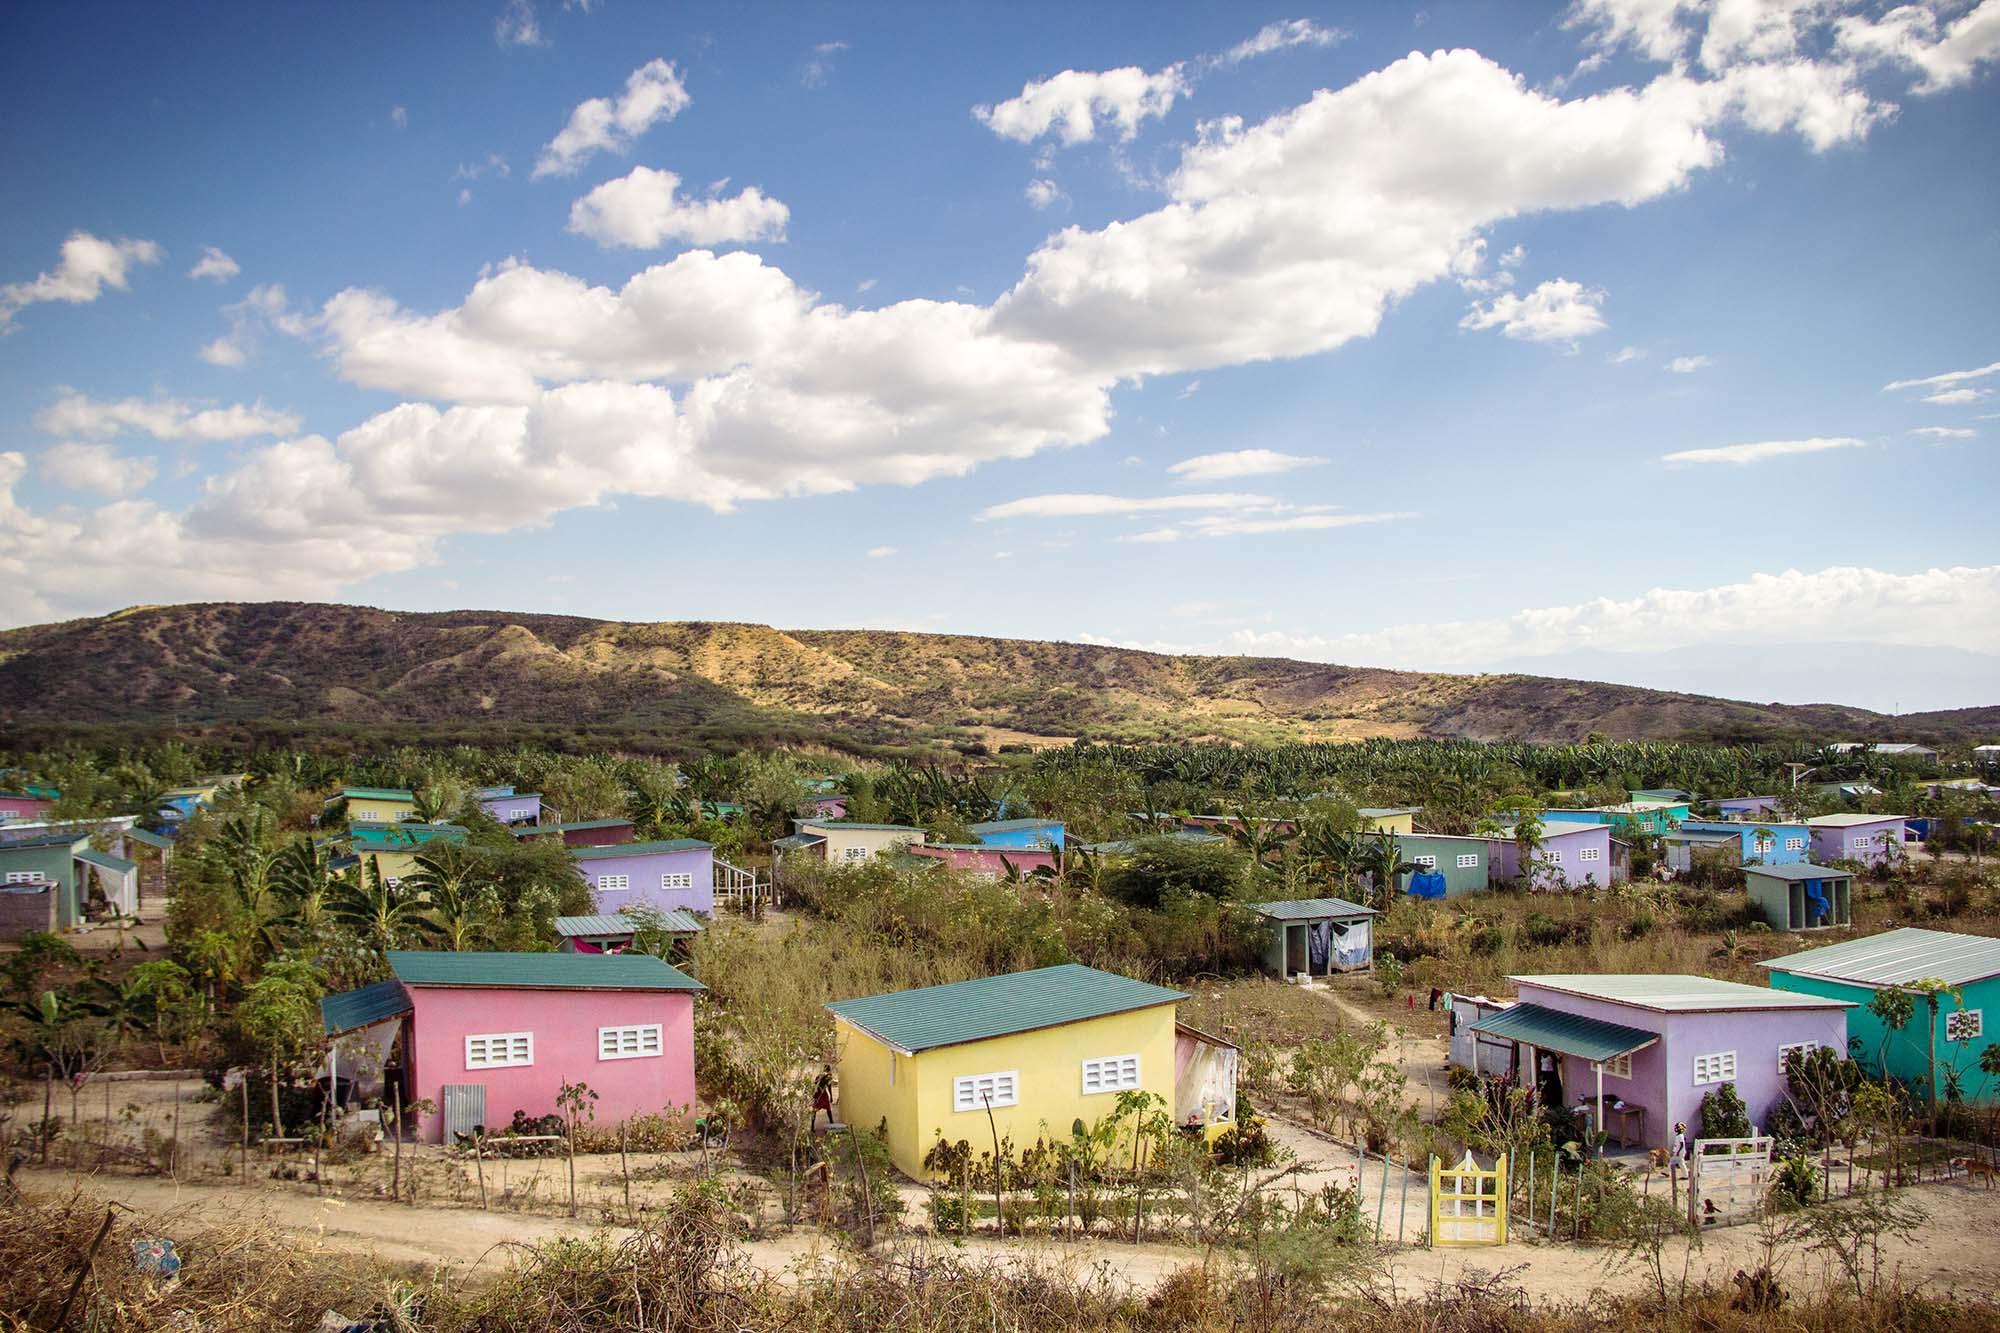 Samaritans Purse, Leveque, Haiti Location | Bercy, Haiti & Beyond